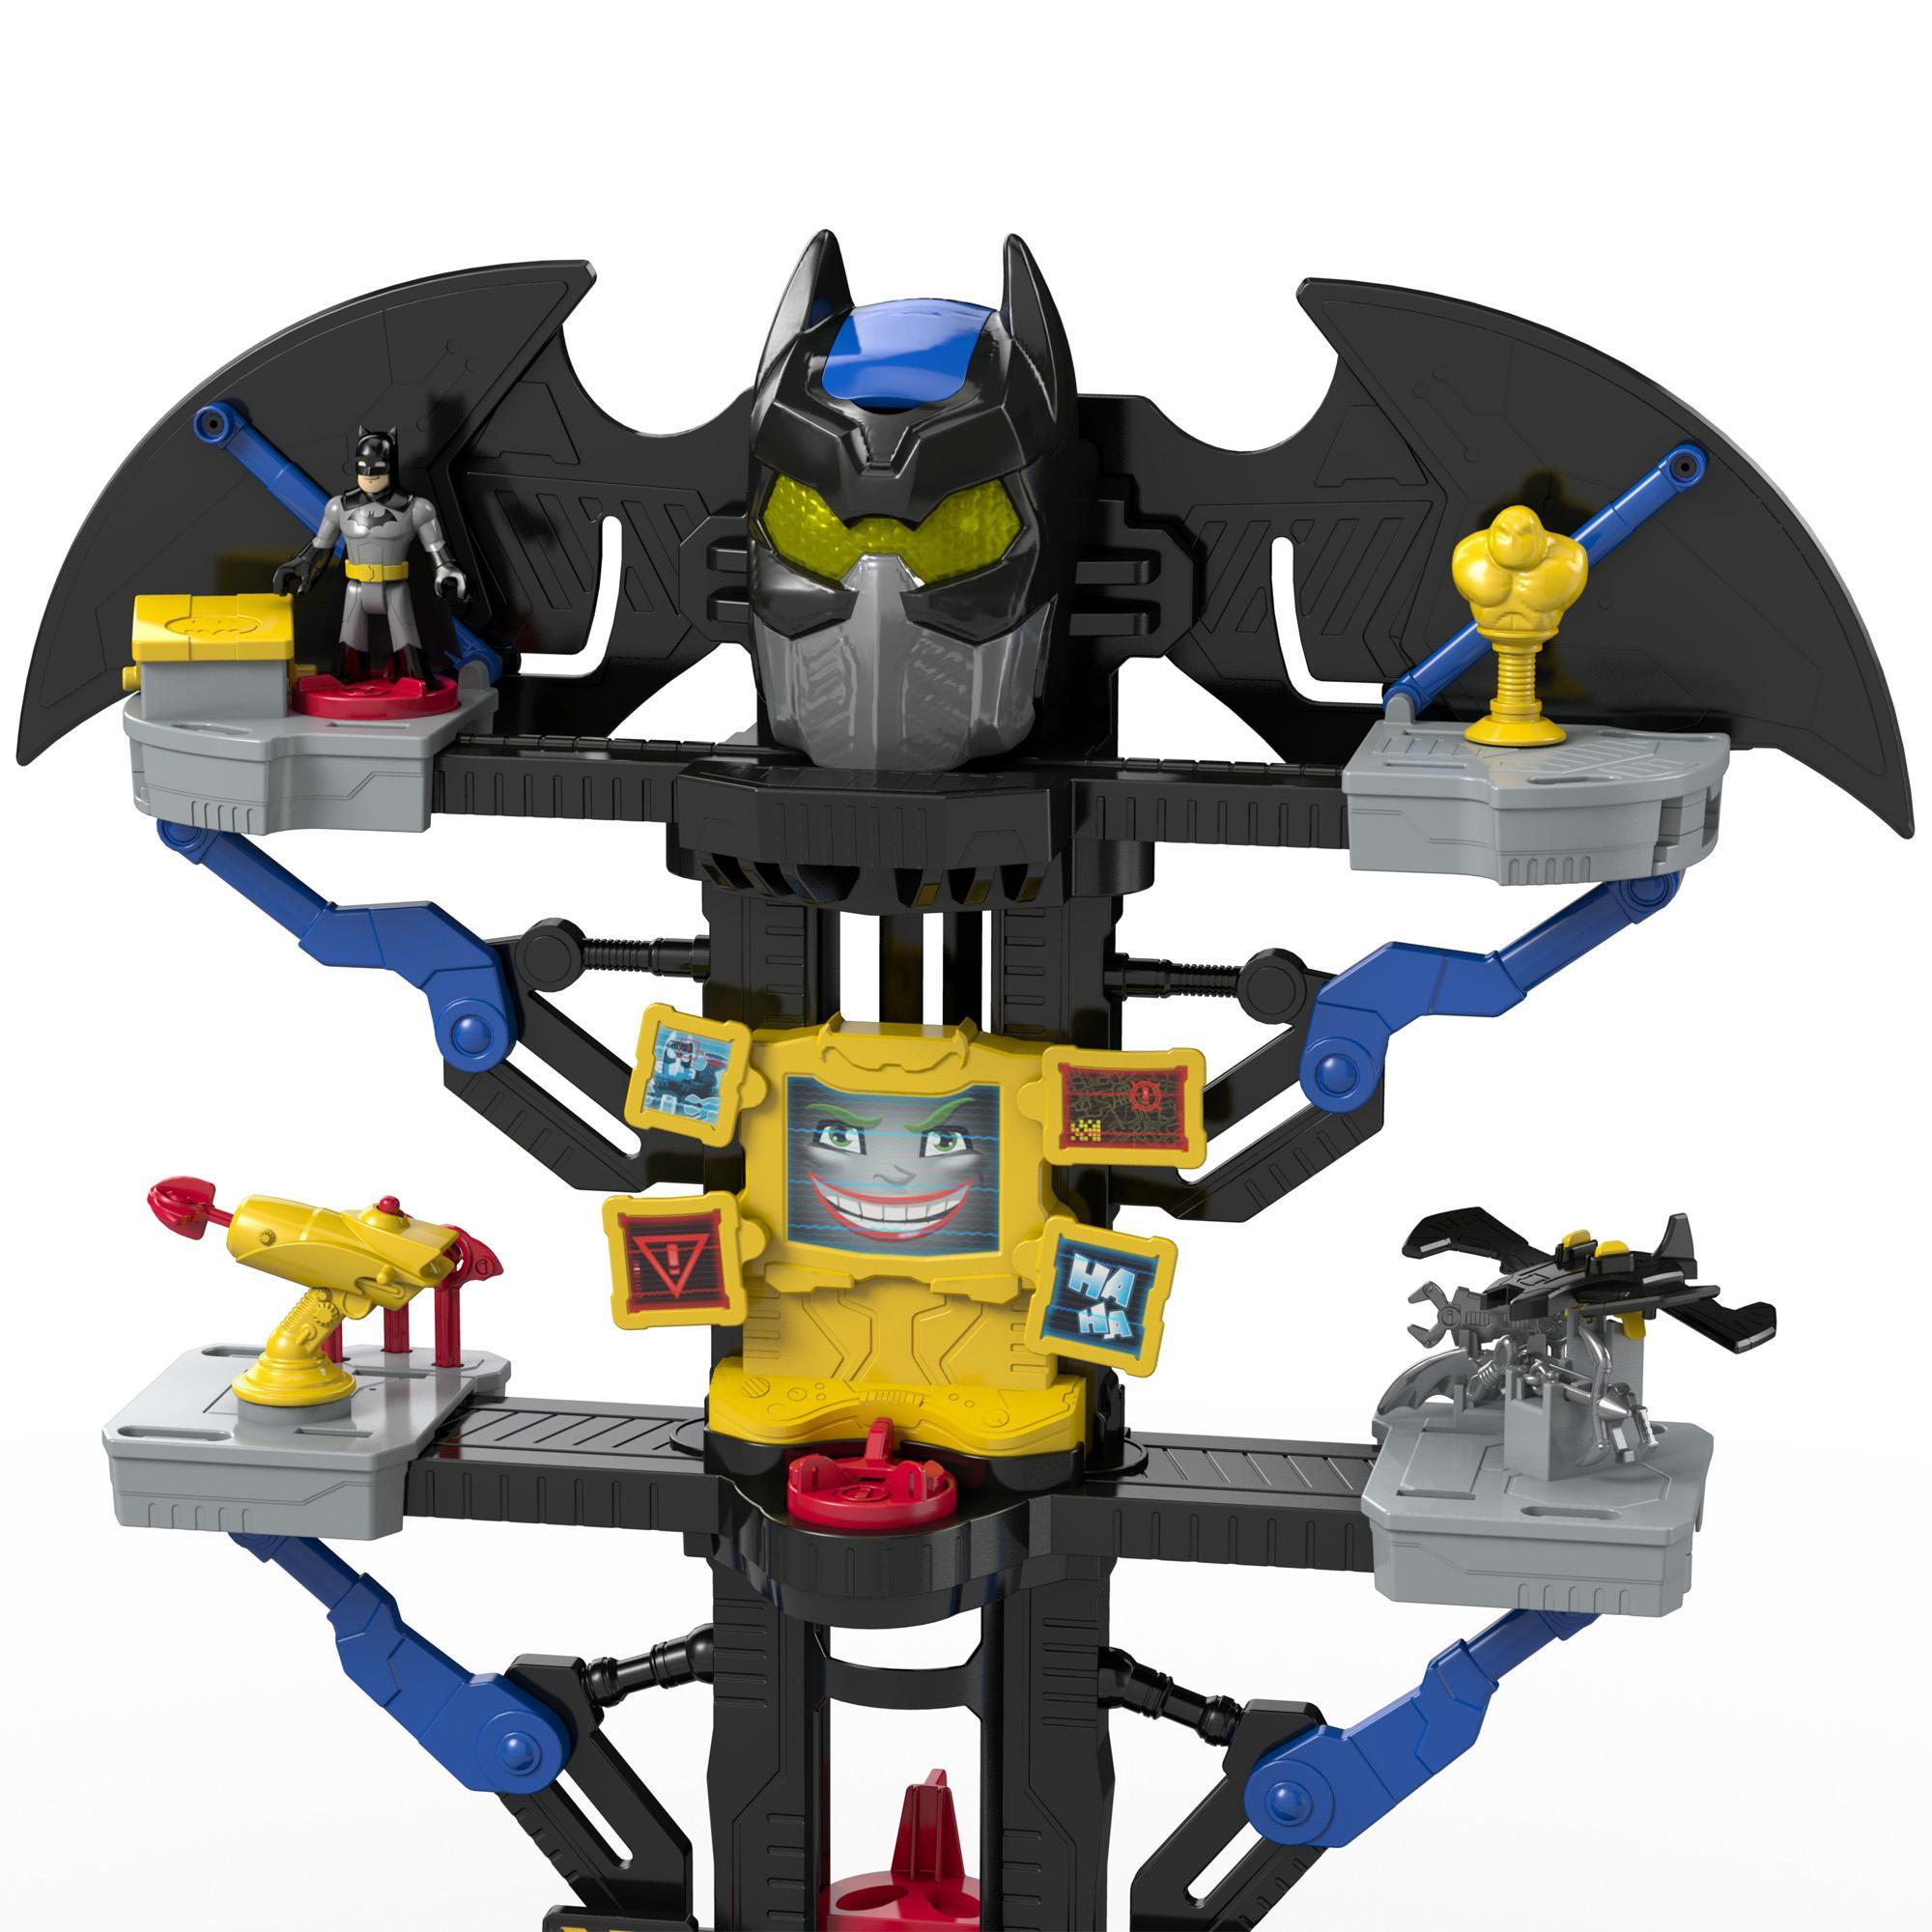 Fisher Price Batman Toys : Amazon fisher price imaginext dc super friends